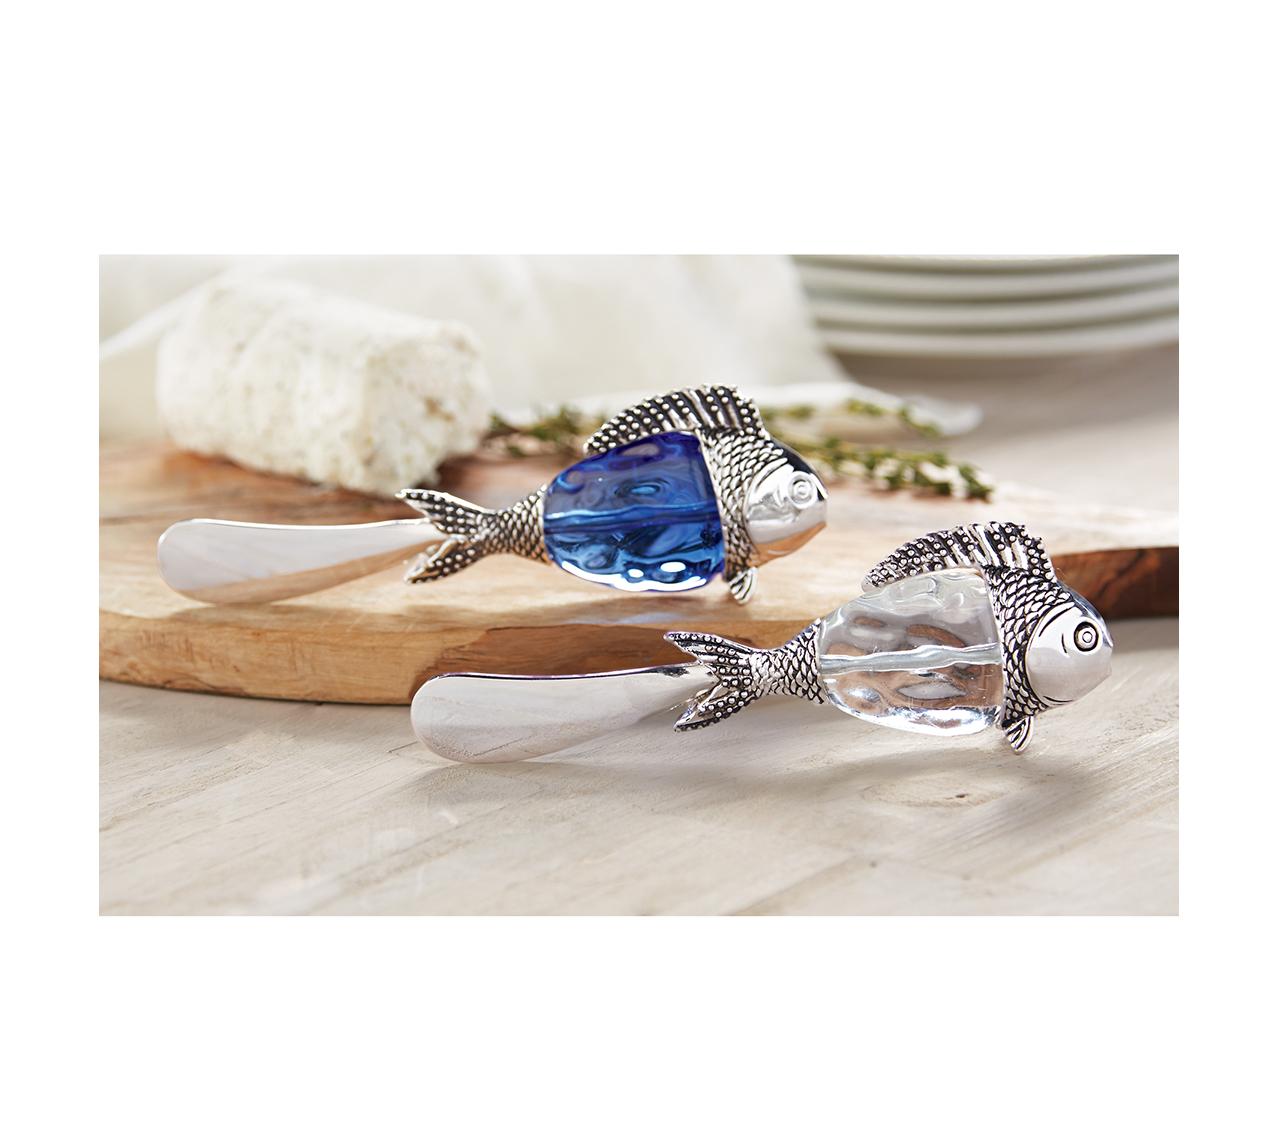 Fishbone online shop